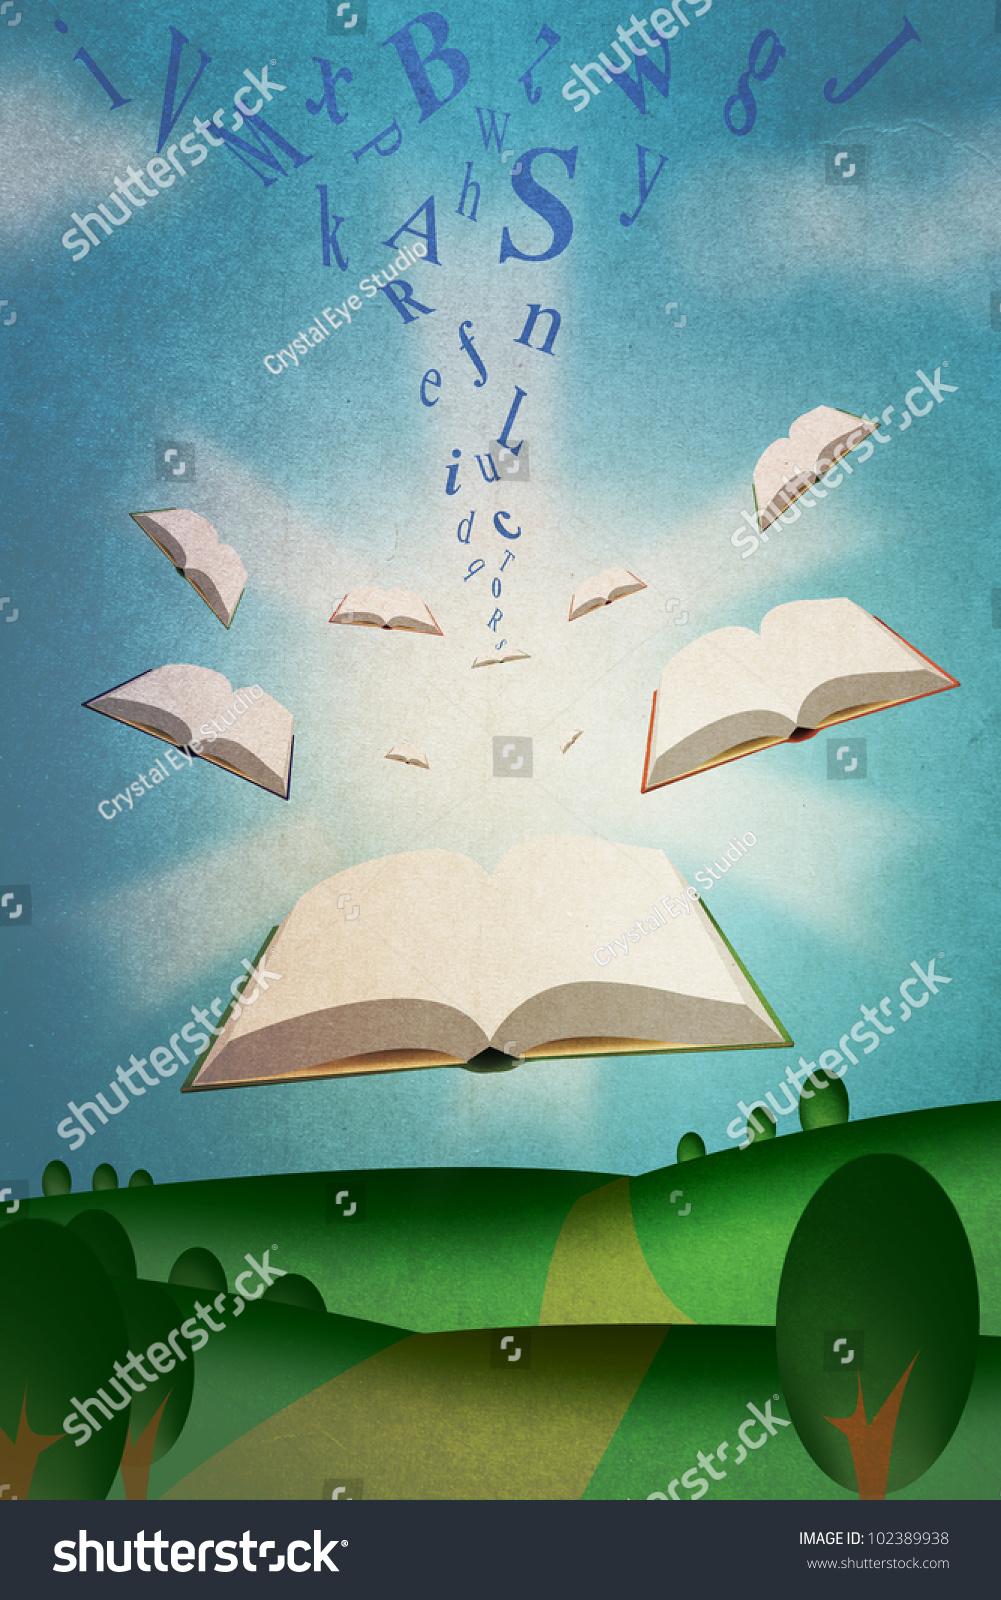 Flying Books Illustration Roman Alphabet Texts Stock Illustration ...